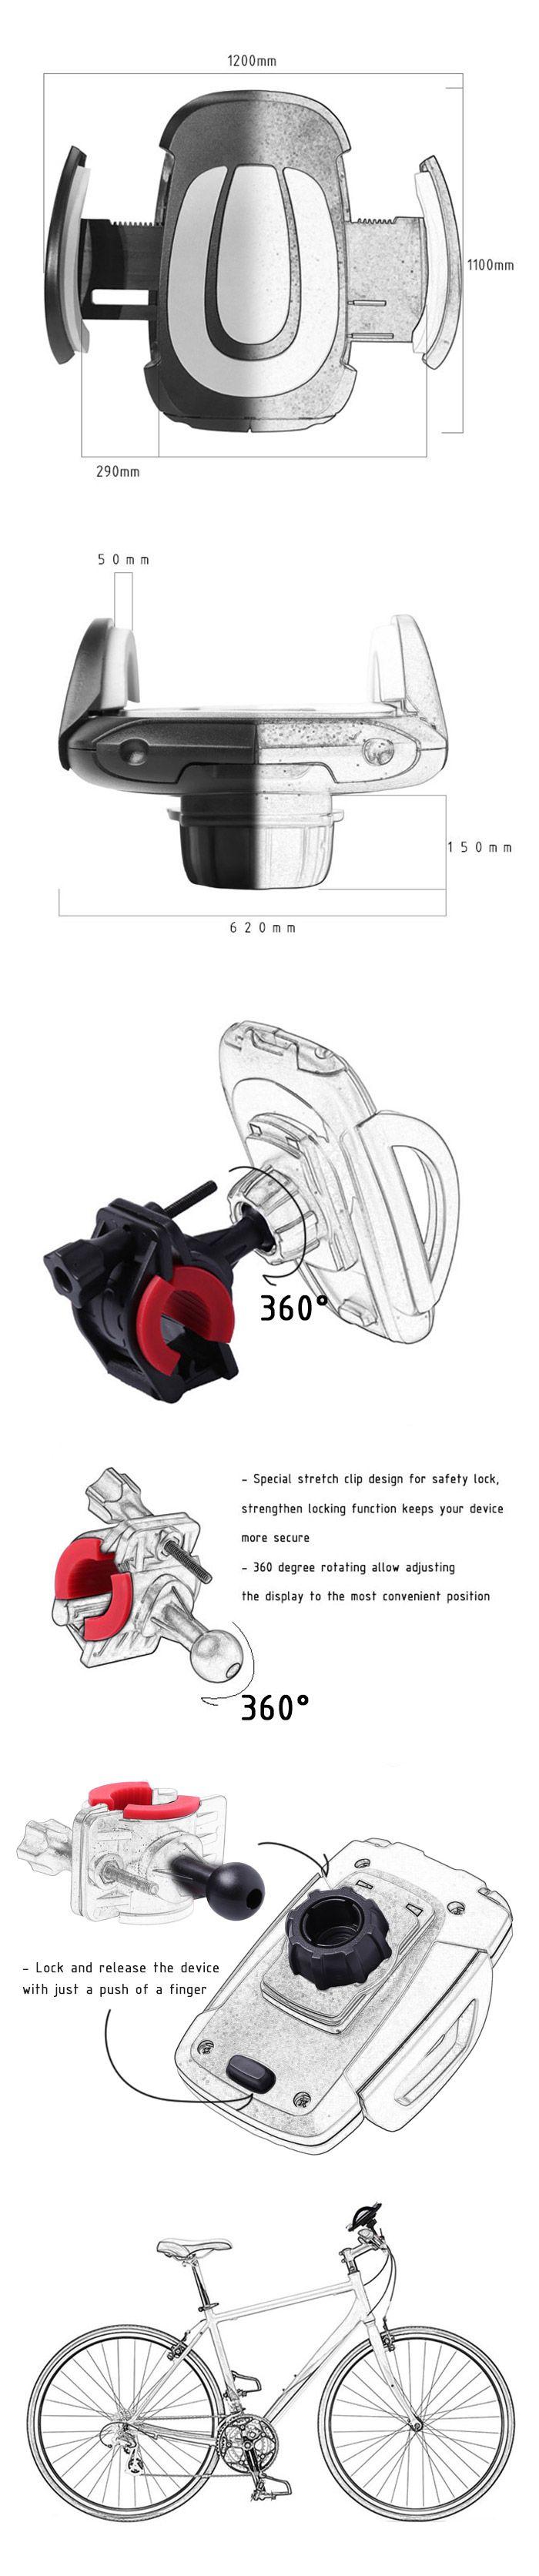 Adjustable 360 Degree Rotation Mobile Phone Mount Holder Stand